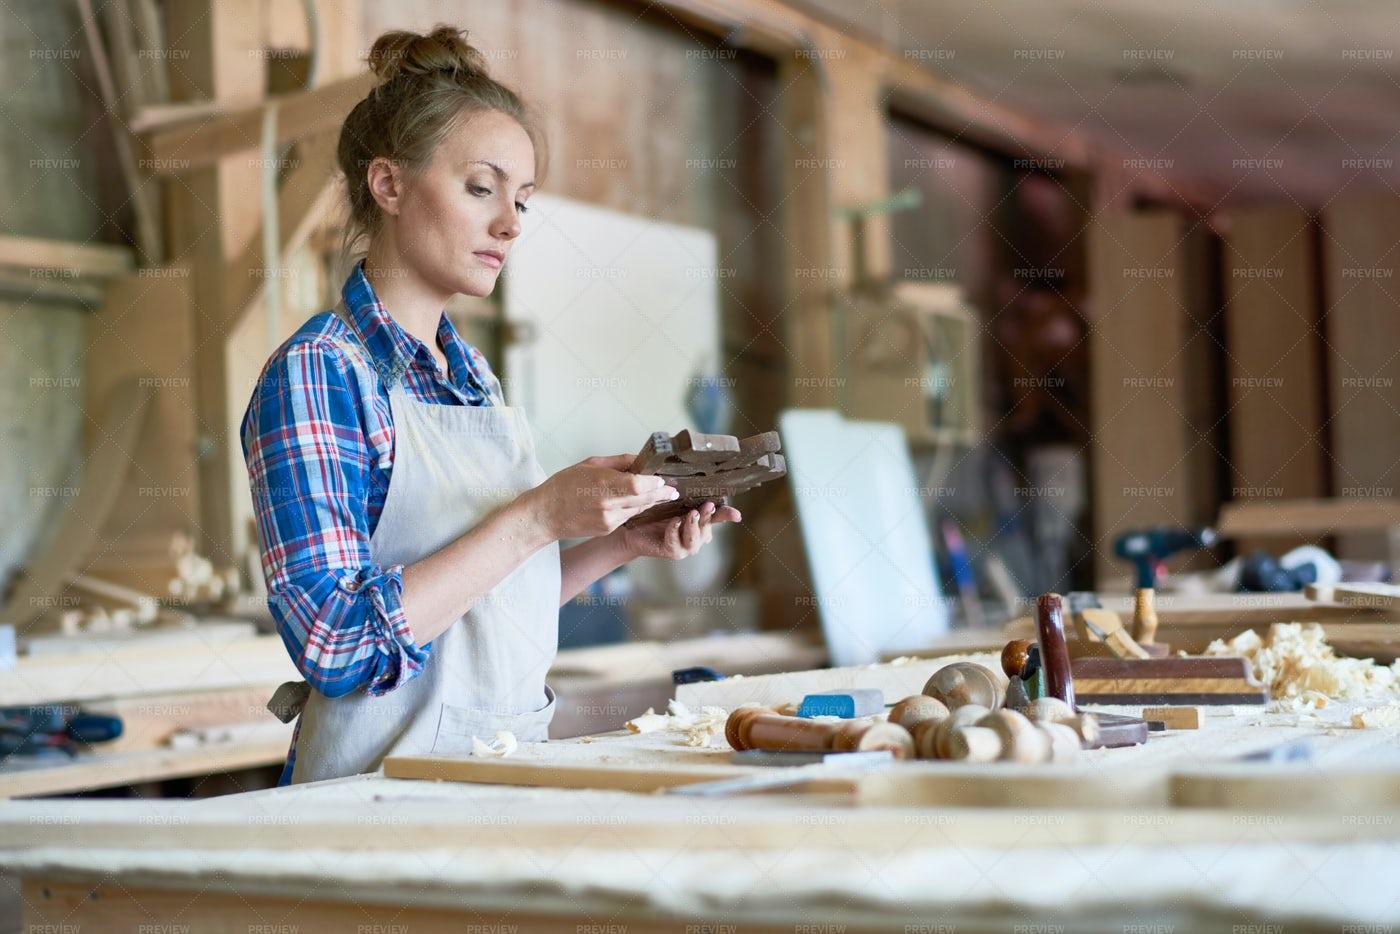 Female Carpenter Holding Wooden...: Stock Photos